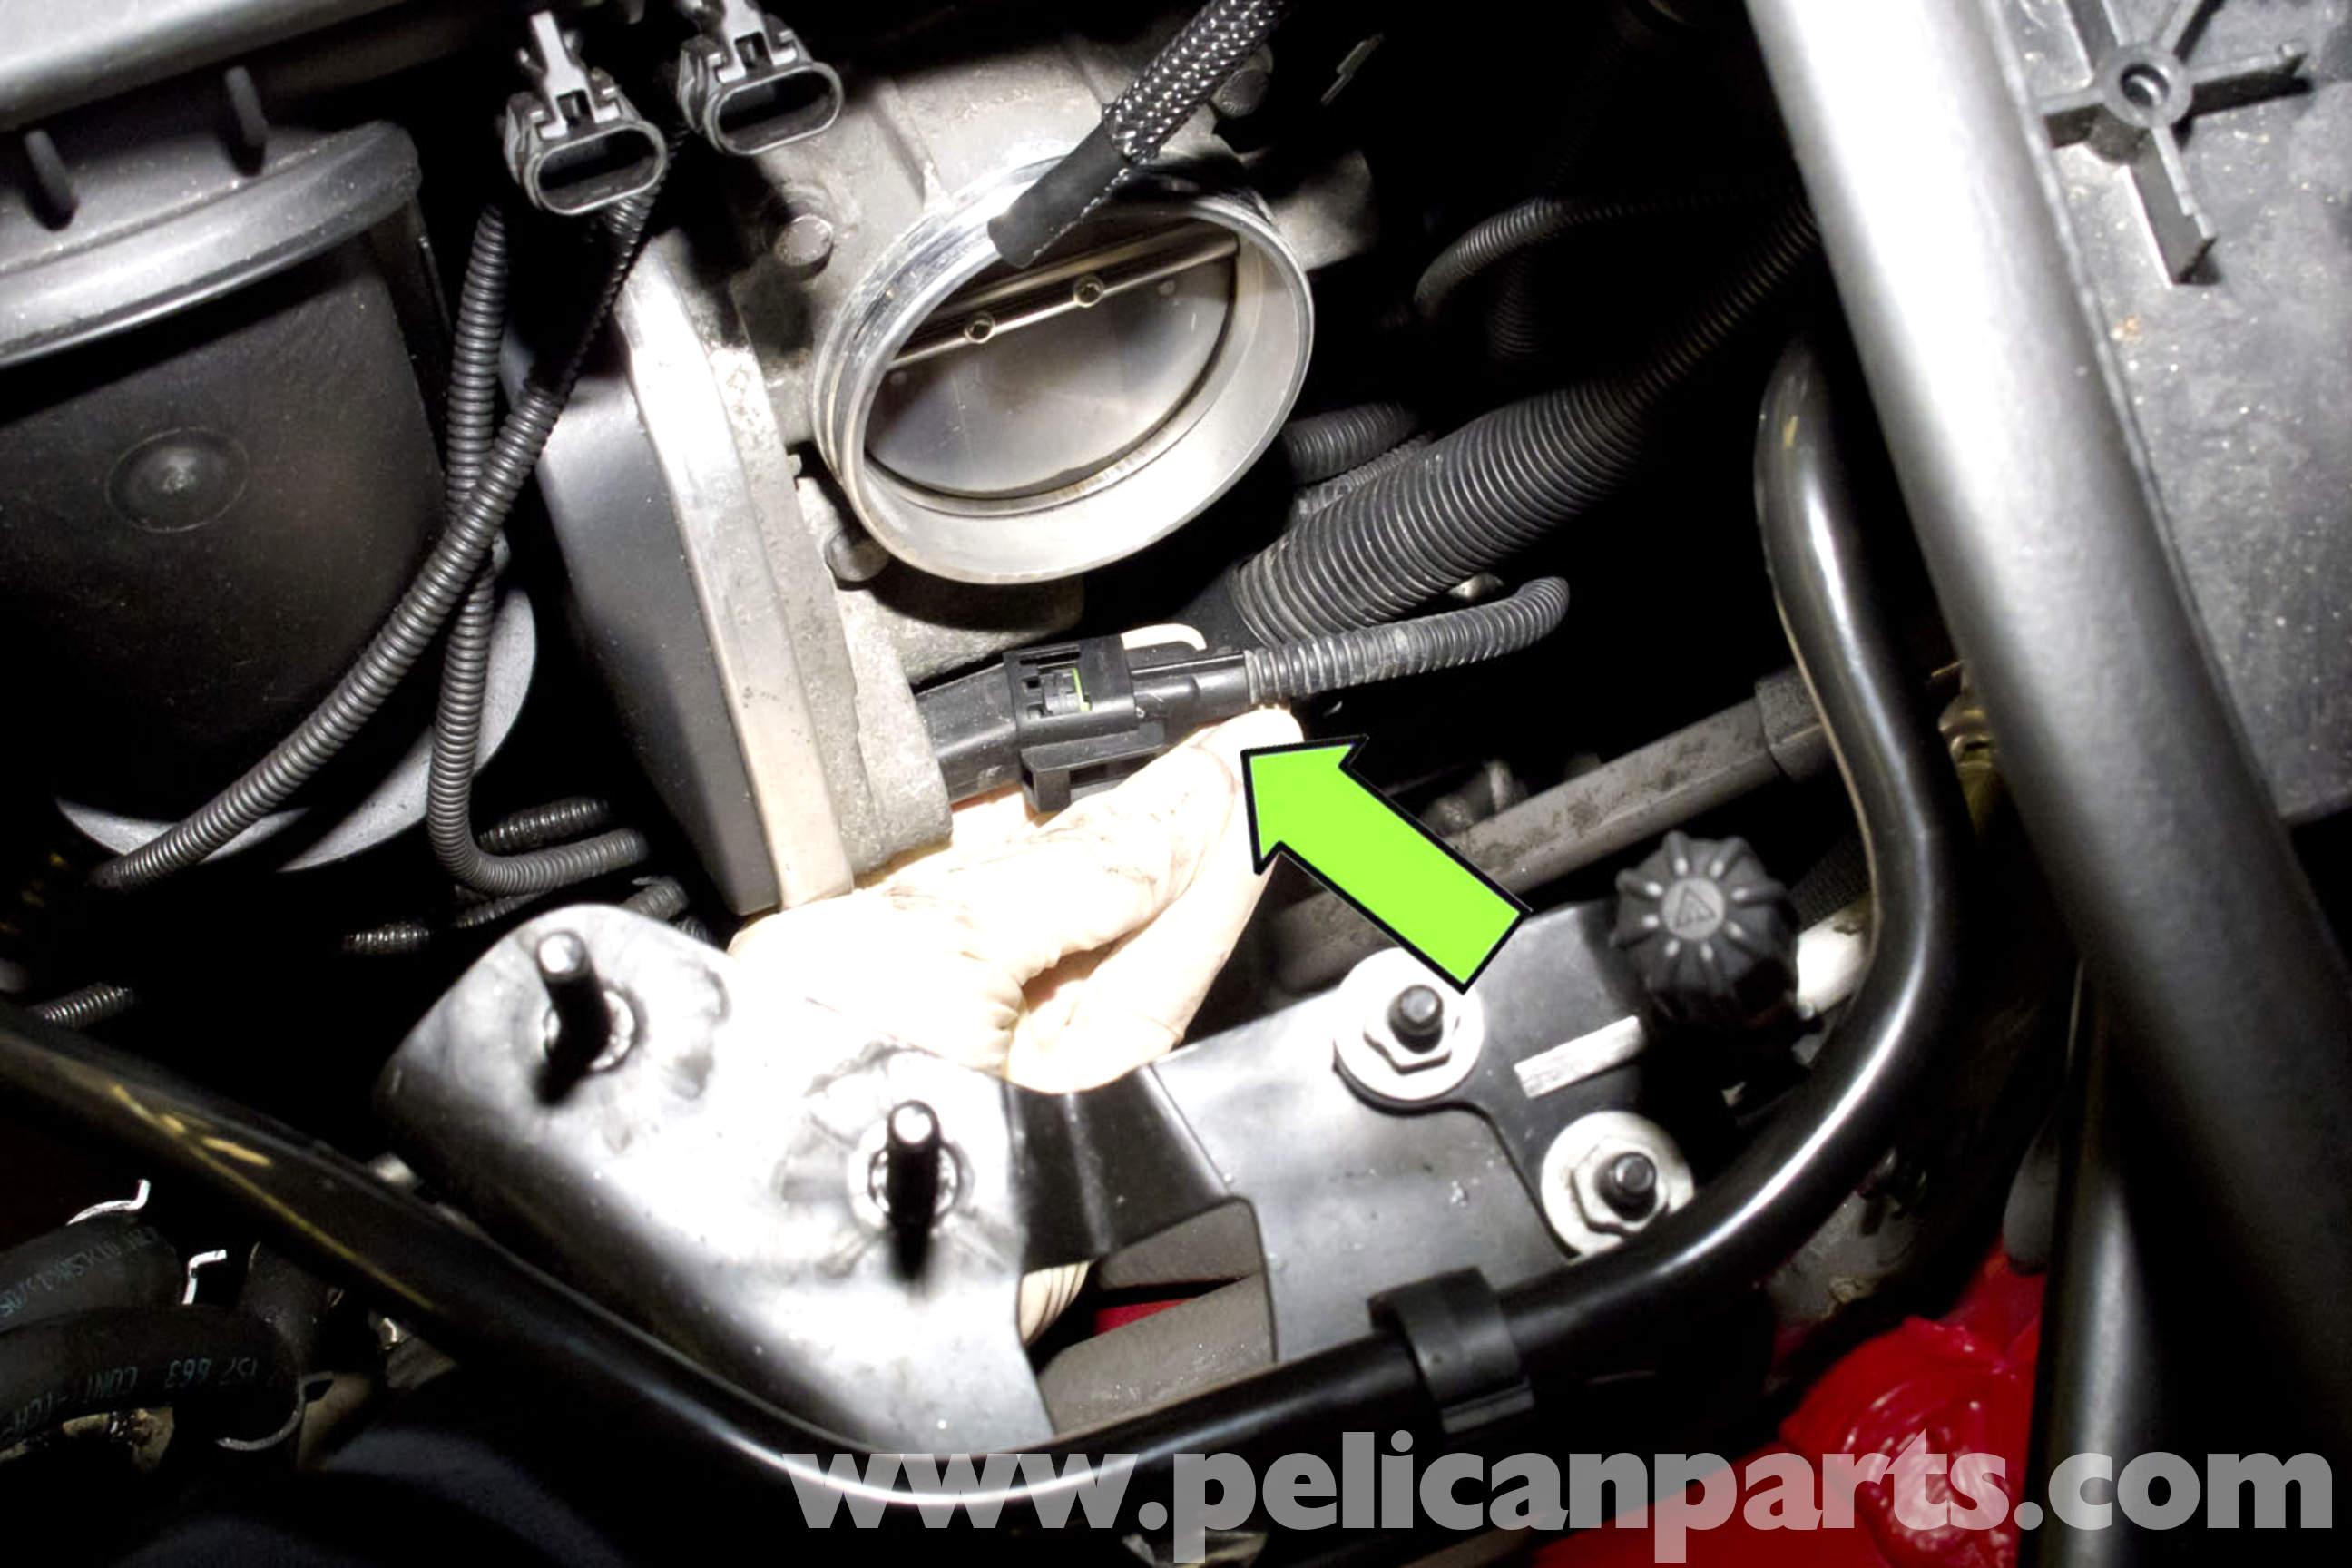 BMW E90 Throttle Body Replacement | E91, E92, E93 | Pelican